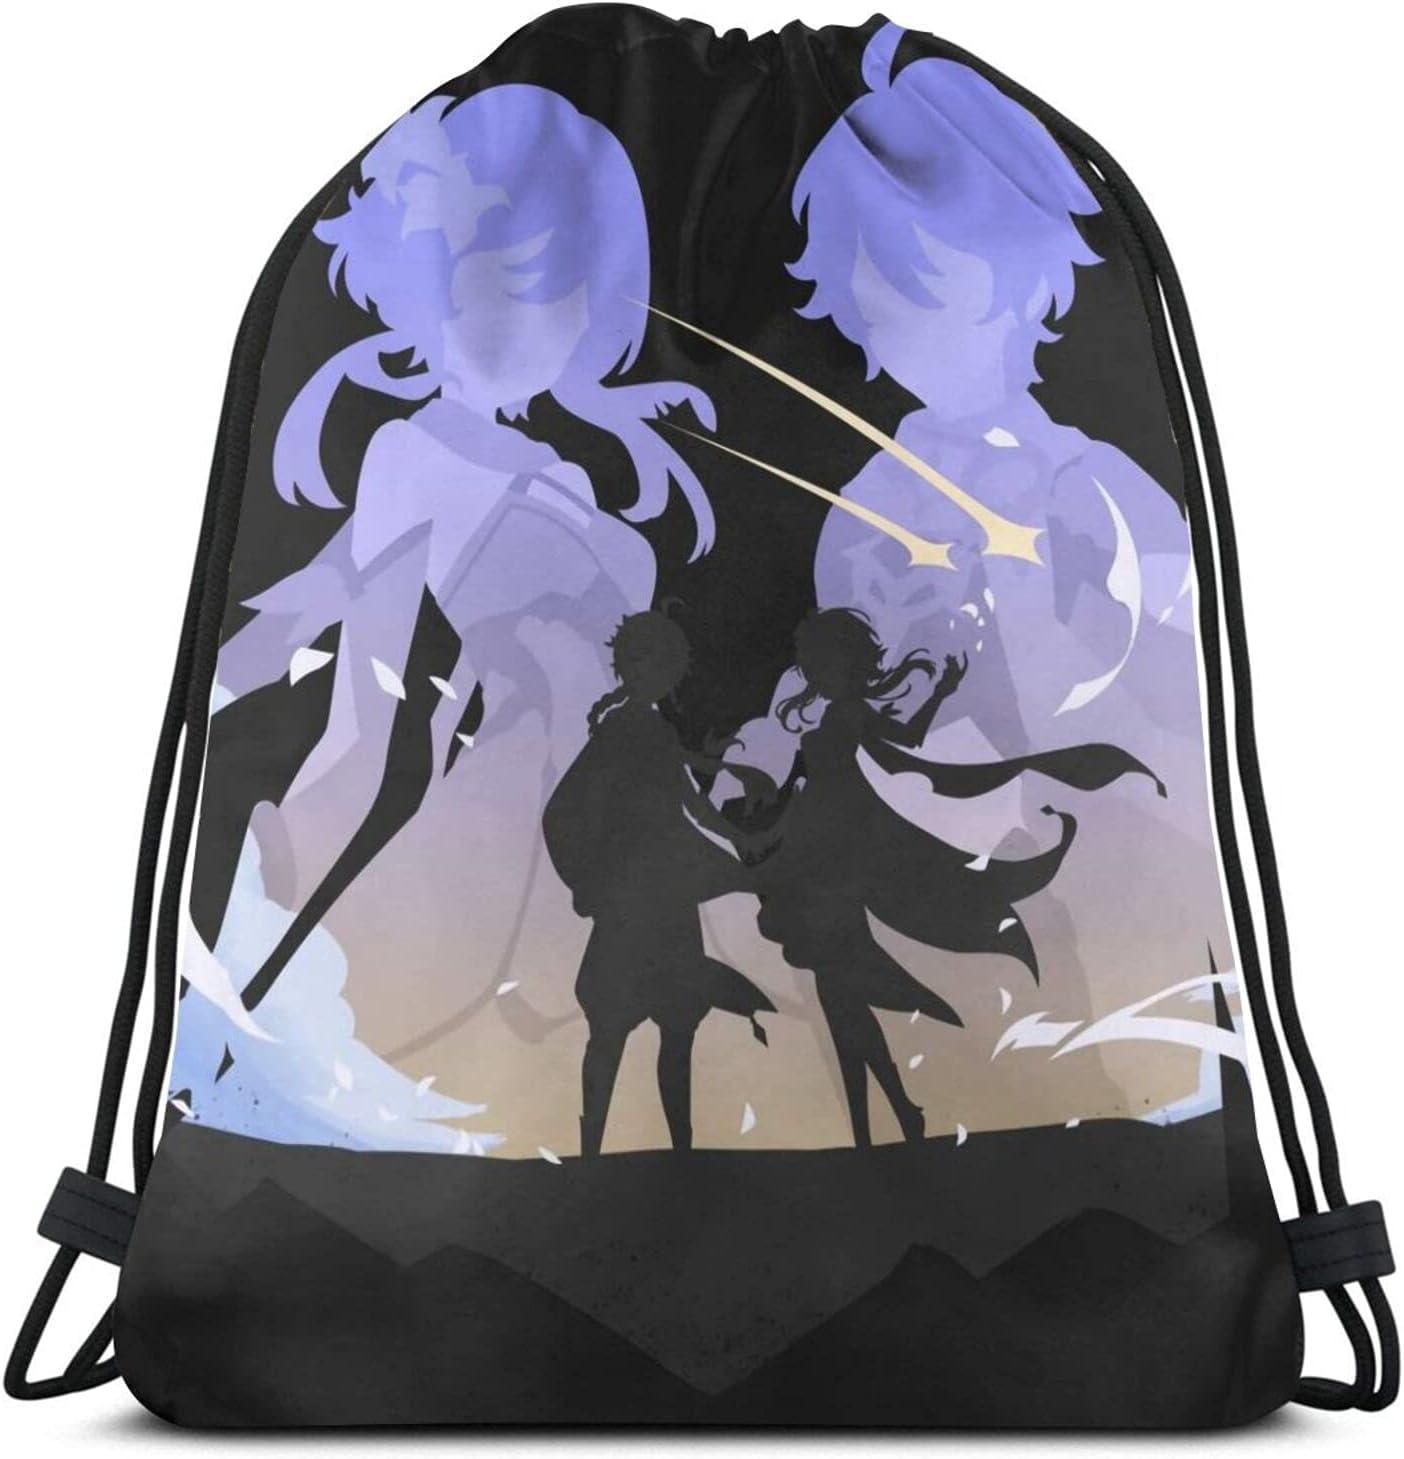 Product Travelers Genshin Impact Drawstring Outlet ☆ Free Shipping Bag Sports Backpa